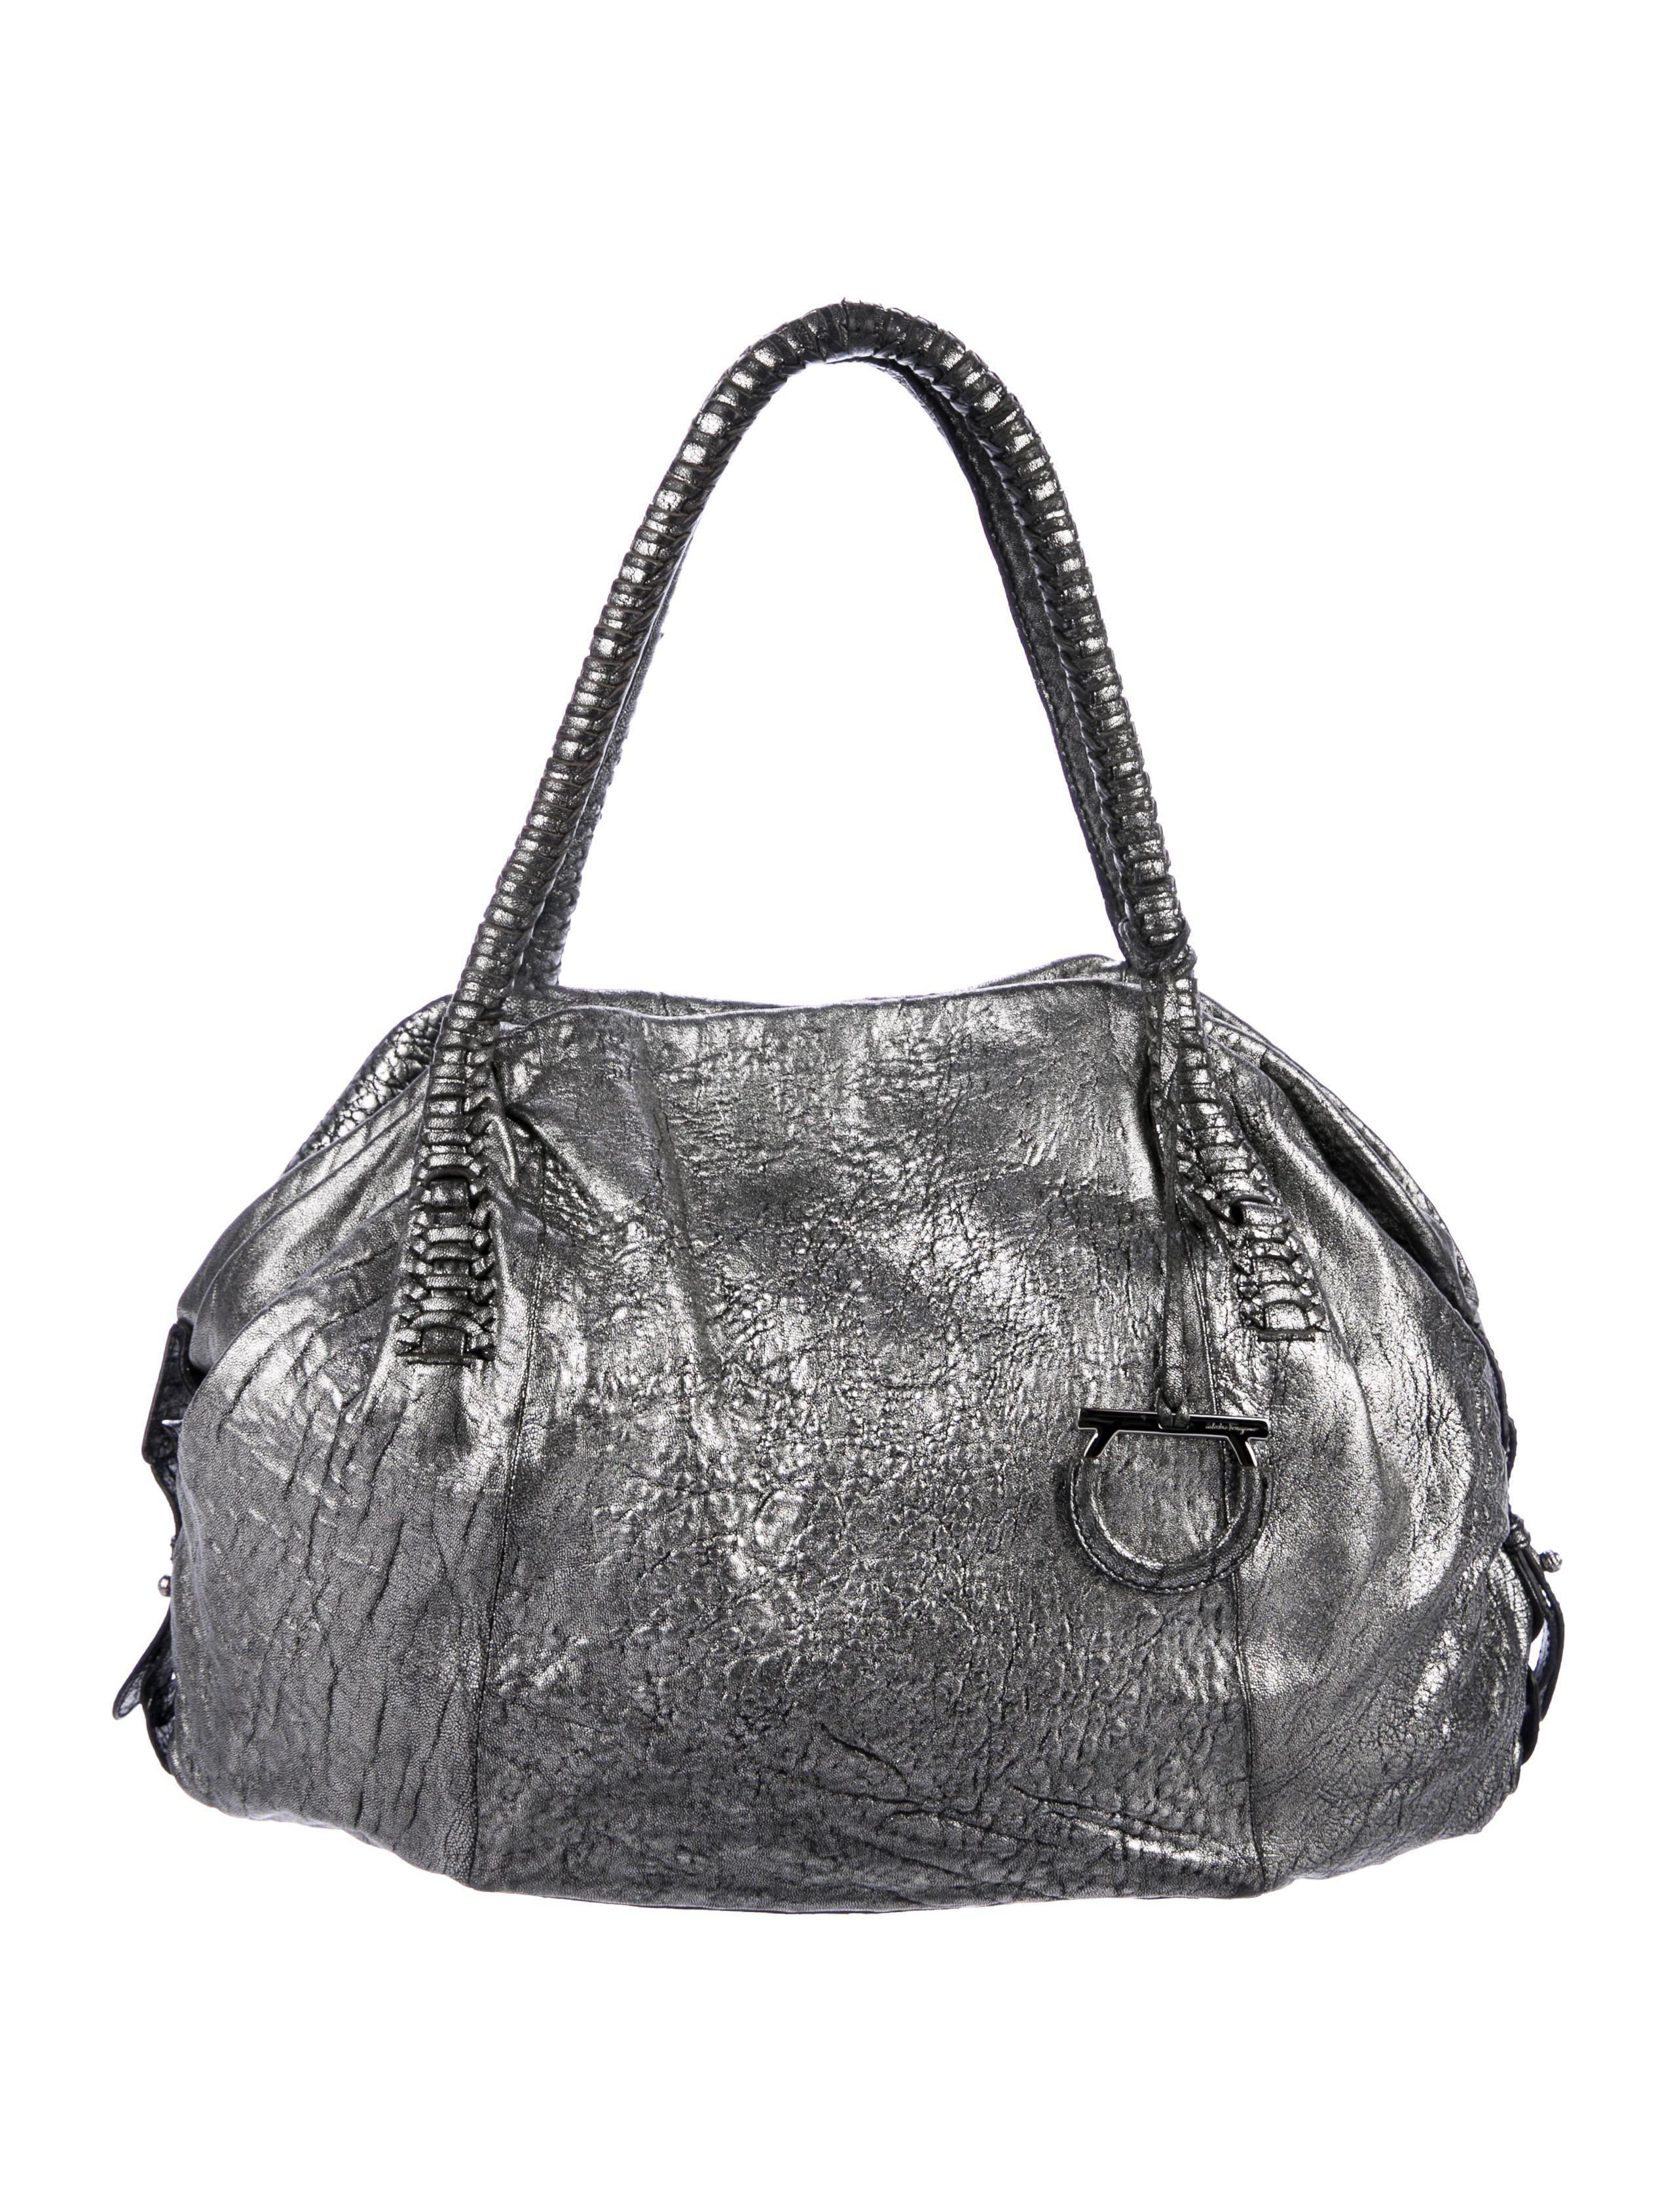 5066d34610a Lyst - Ferragamo Distressed Leather Tote in Metallic